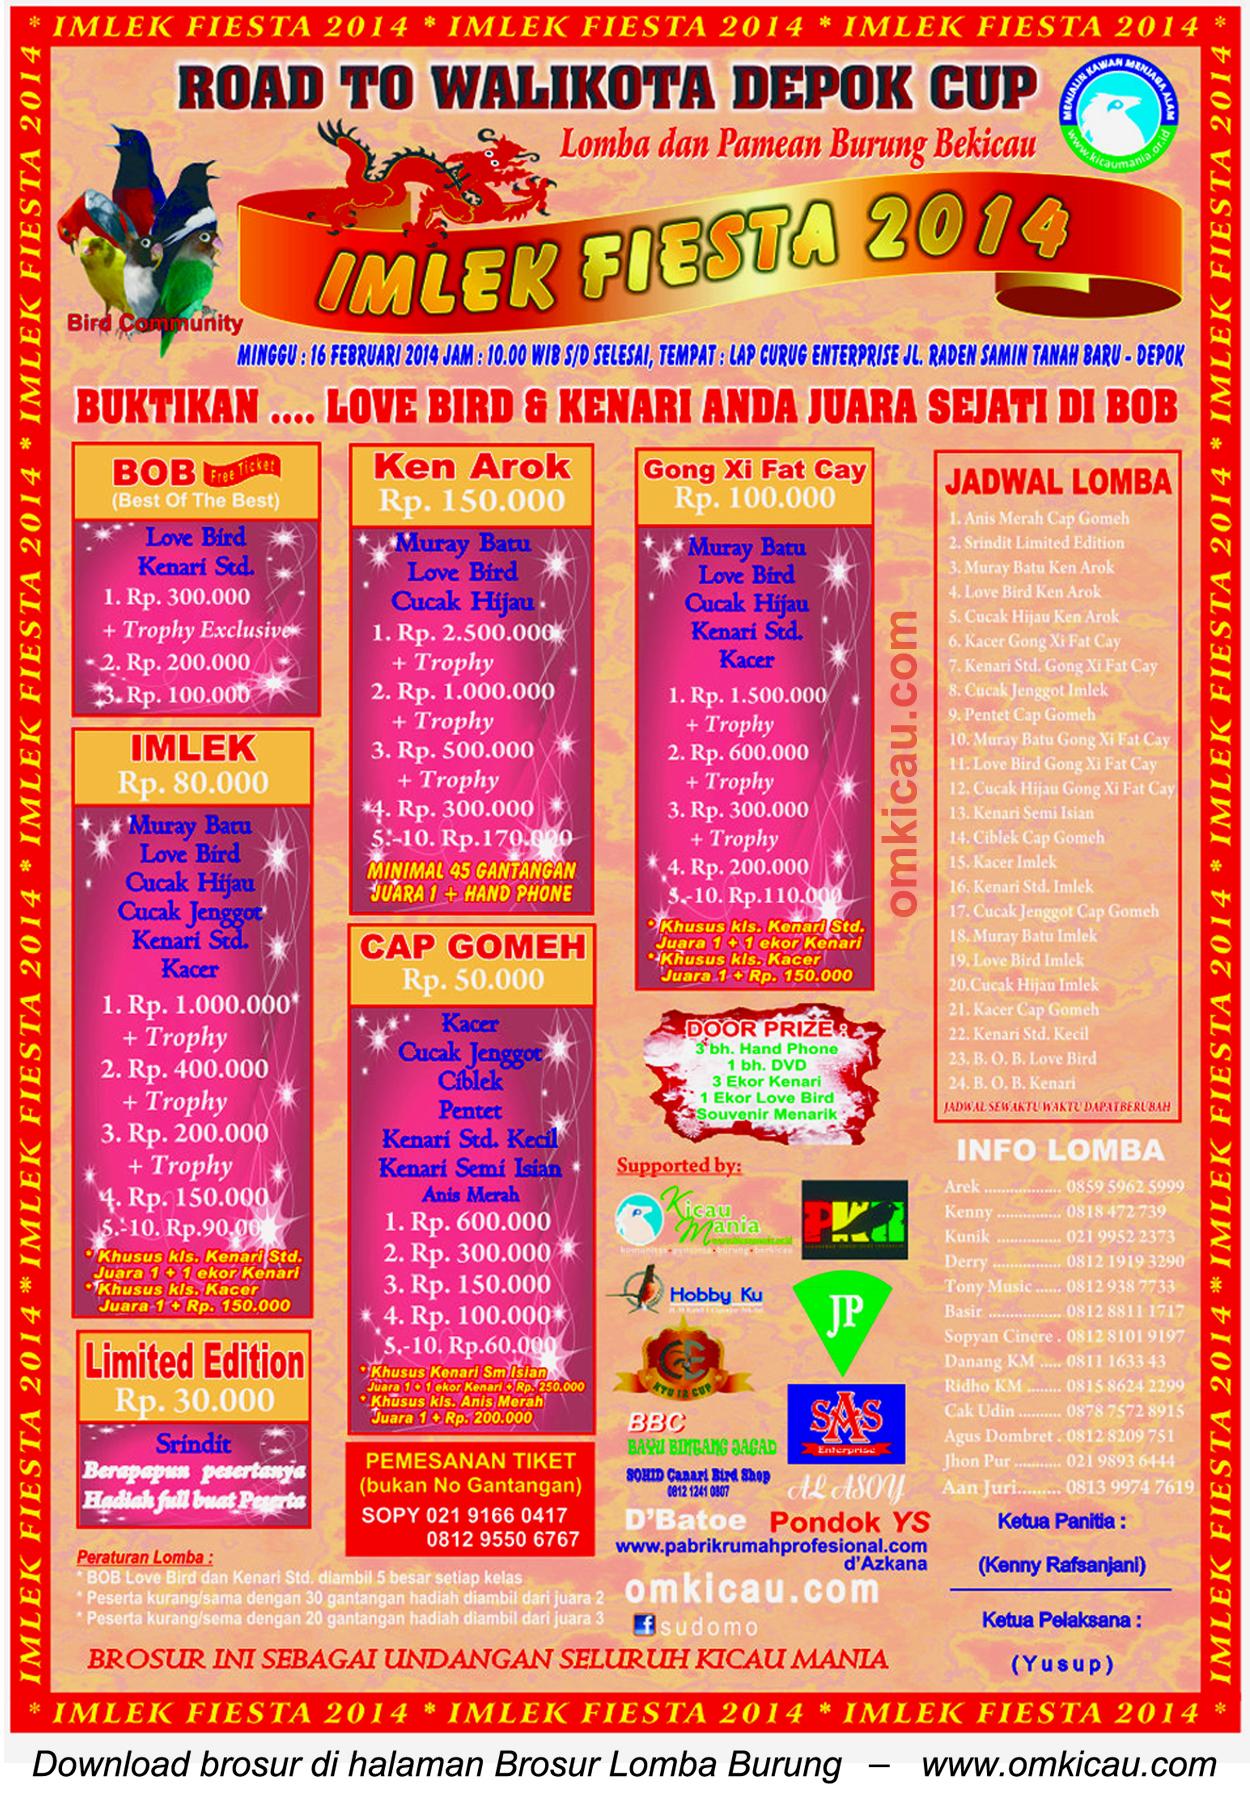 Brosur Lomba Burung Berkicau Imlek Fiesta, Depok, 16 Februari 2014